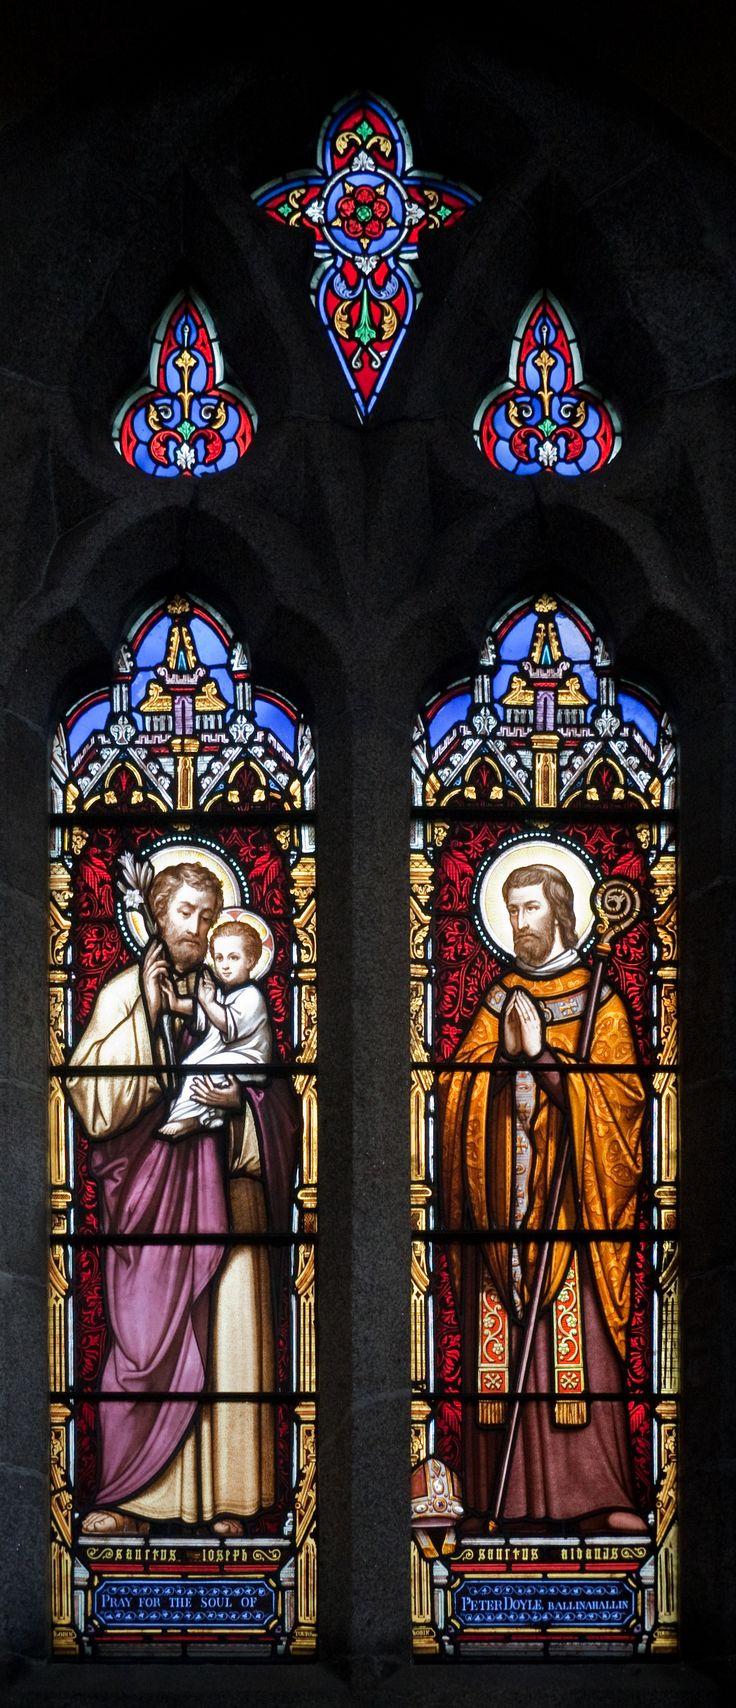 St. Joseph & St. Aidan (St. Aidan's Cathedral, Enniscorthy, County Wexford, Ireland)